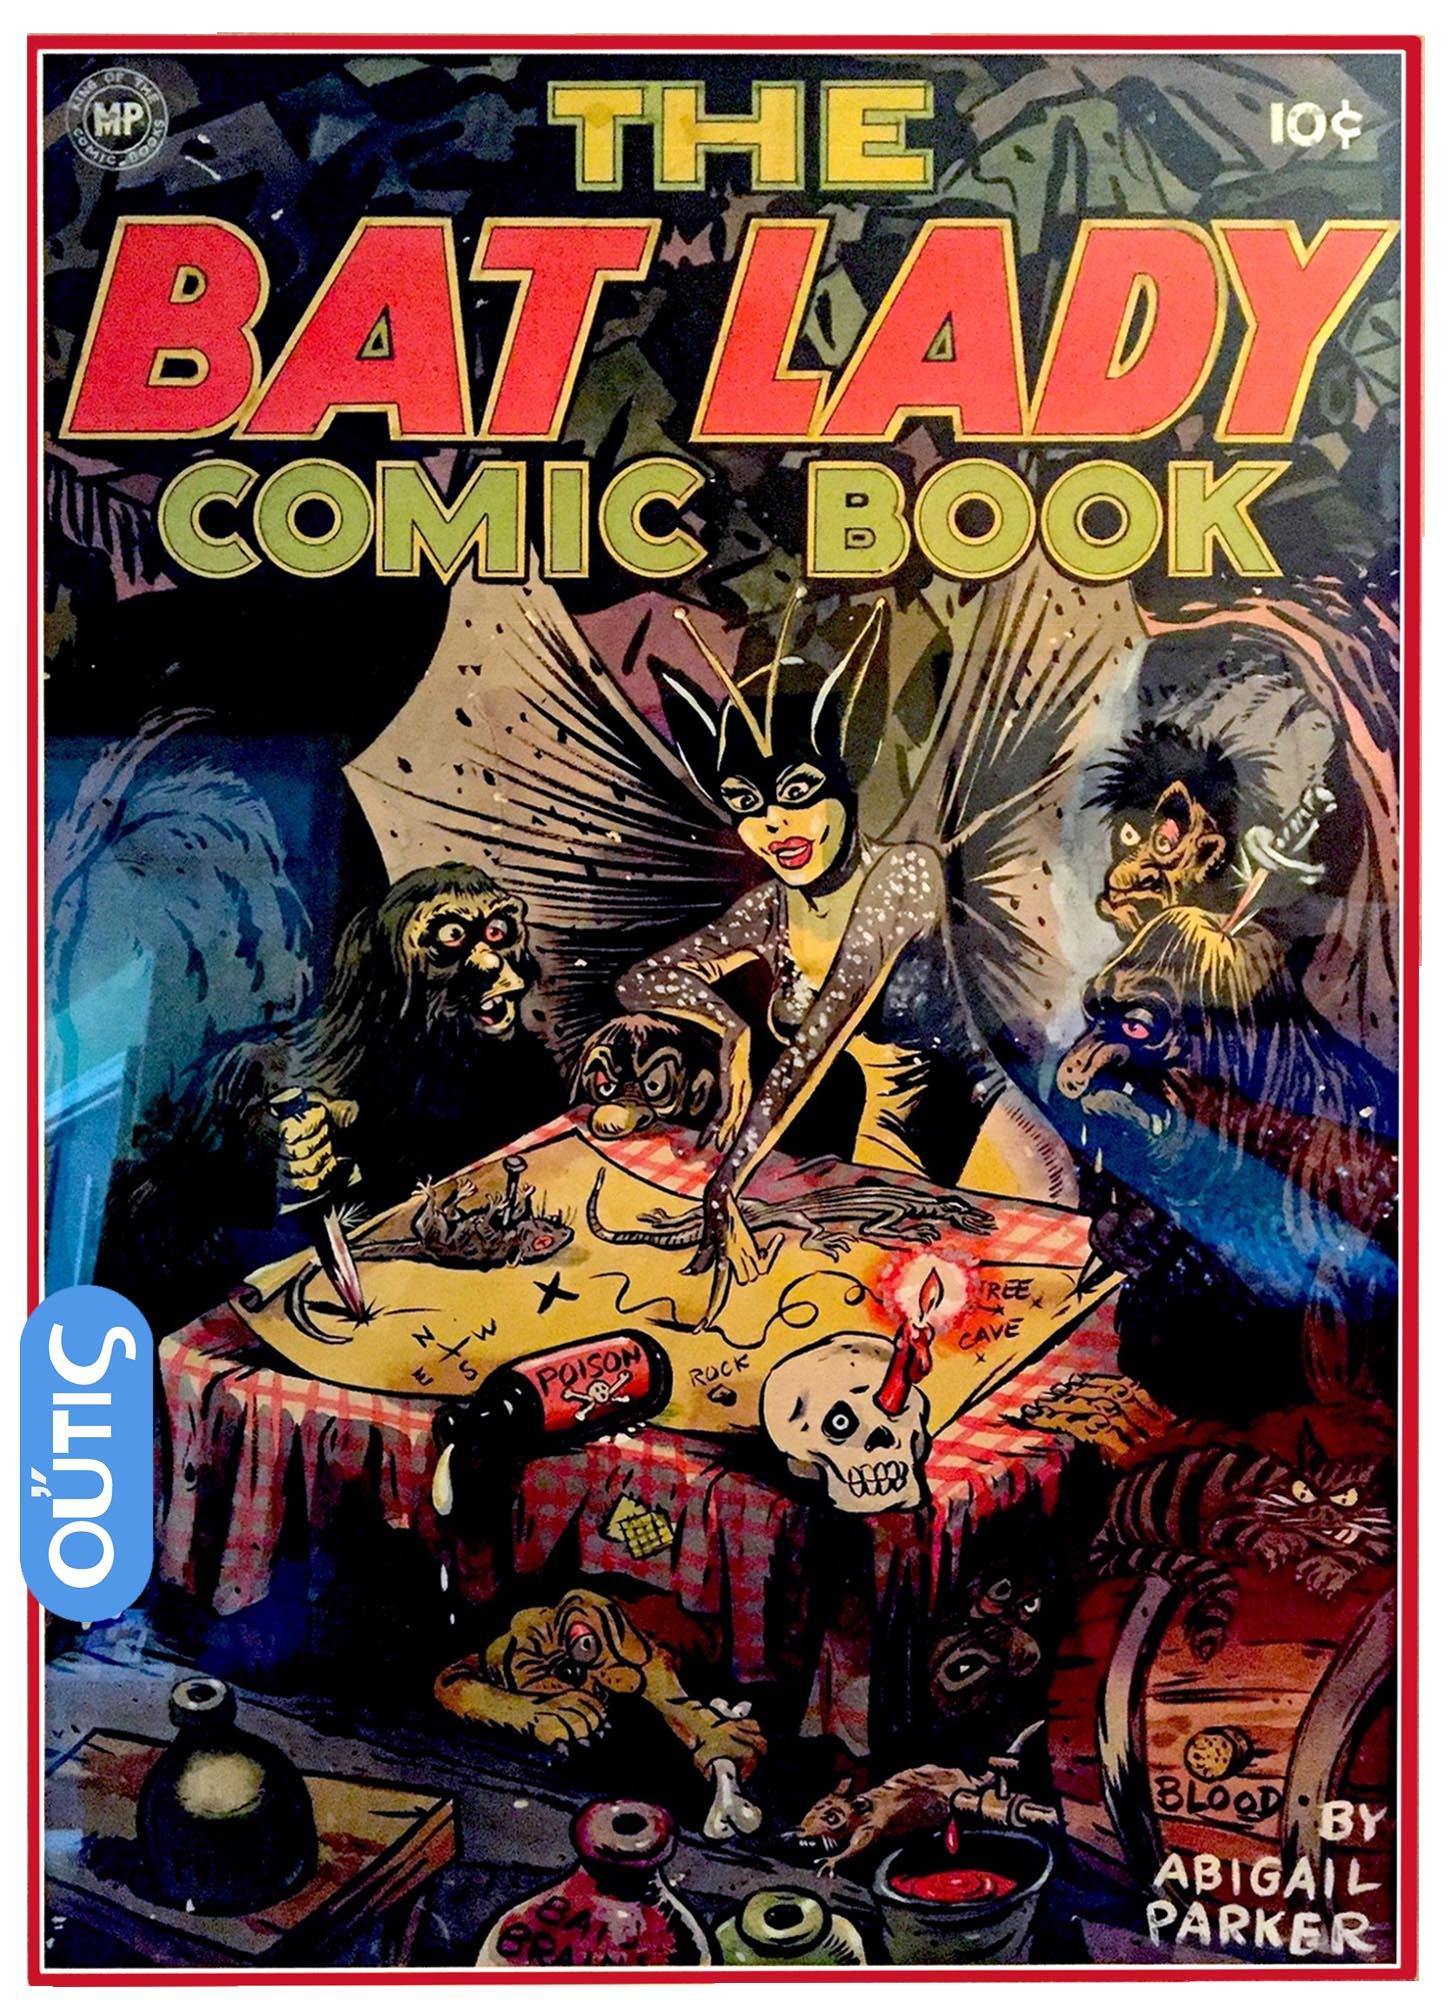 The Bat Lady comic book cover